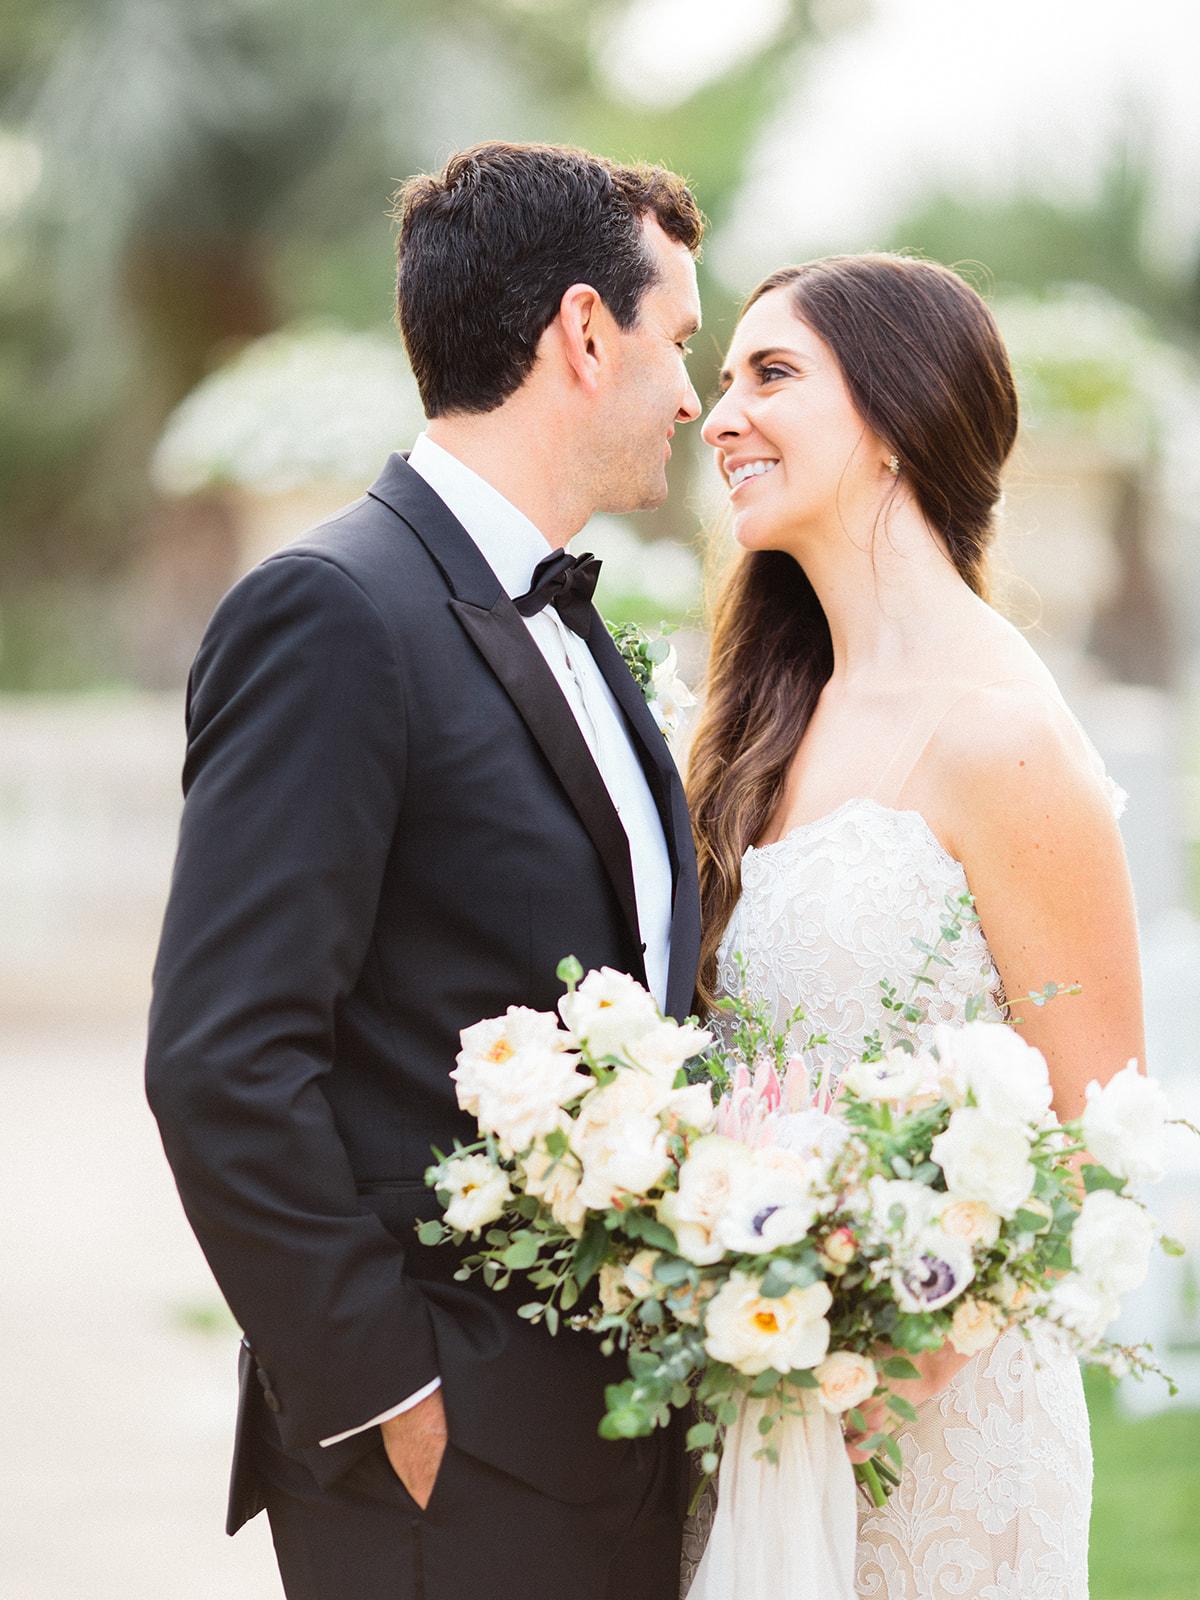 Melissa-Dave-Wedding-663.jpg